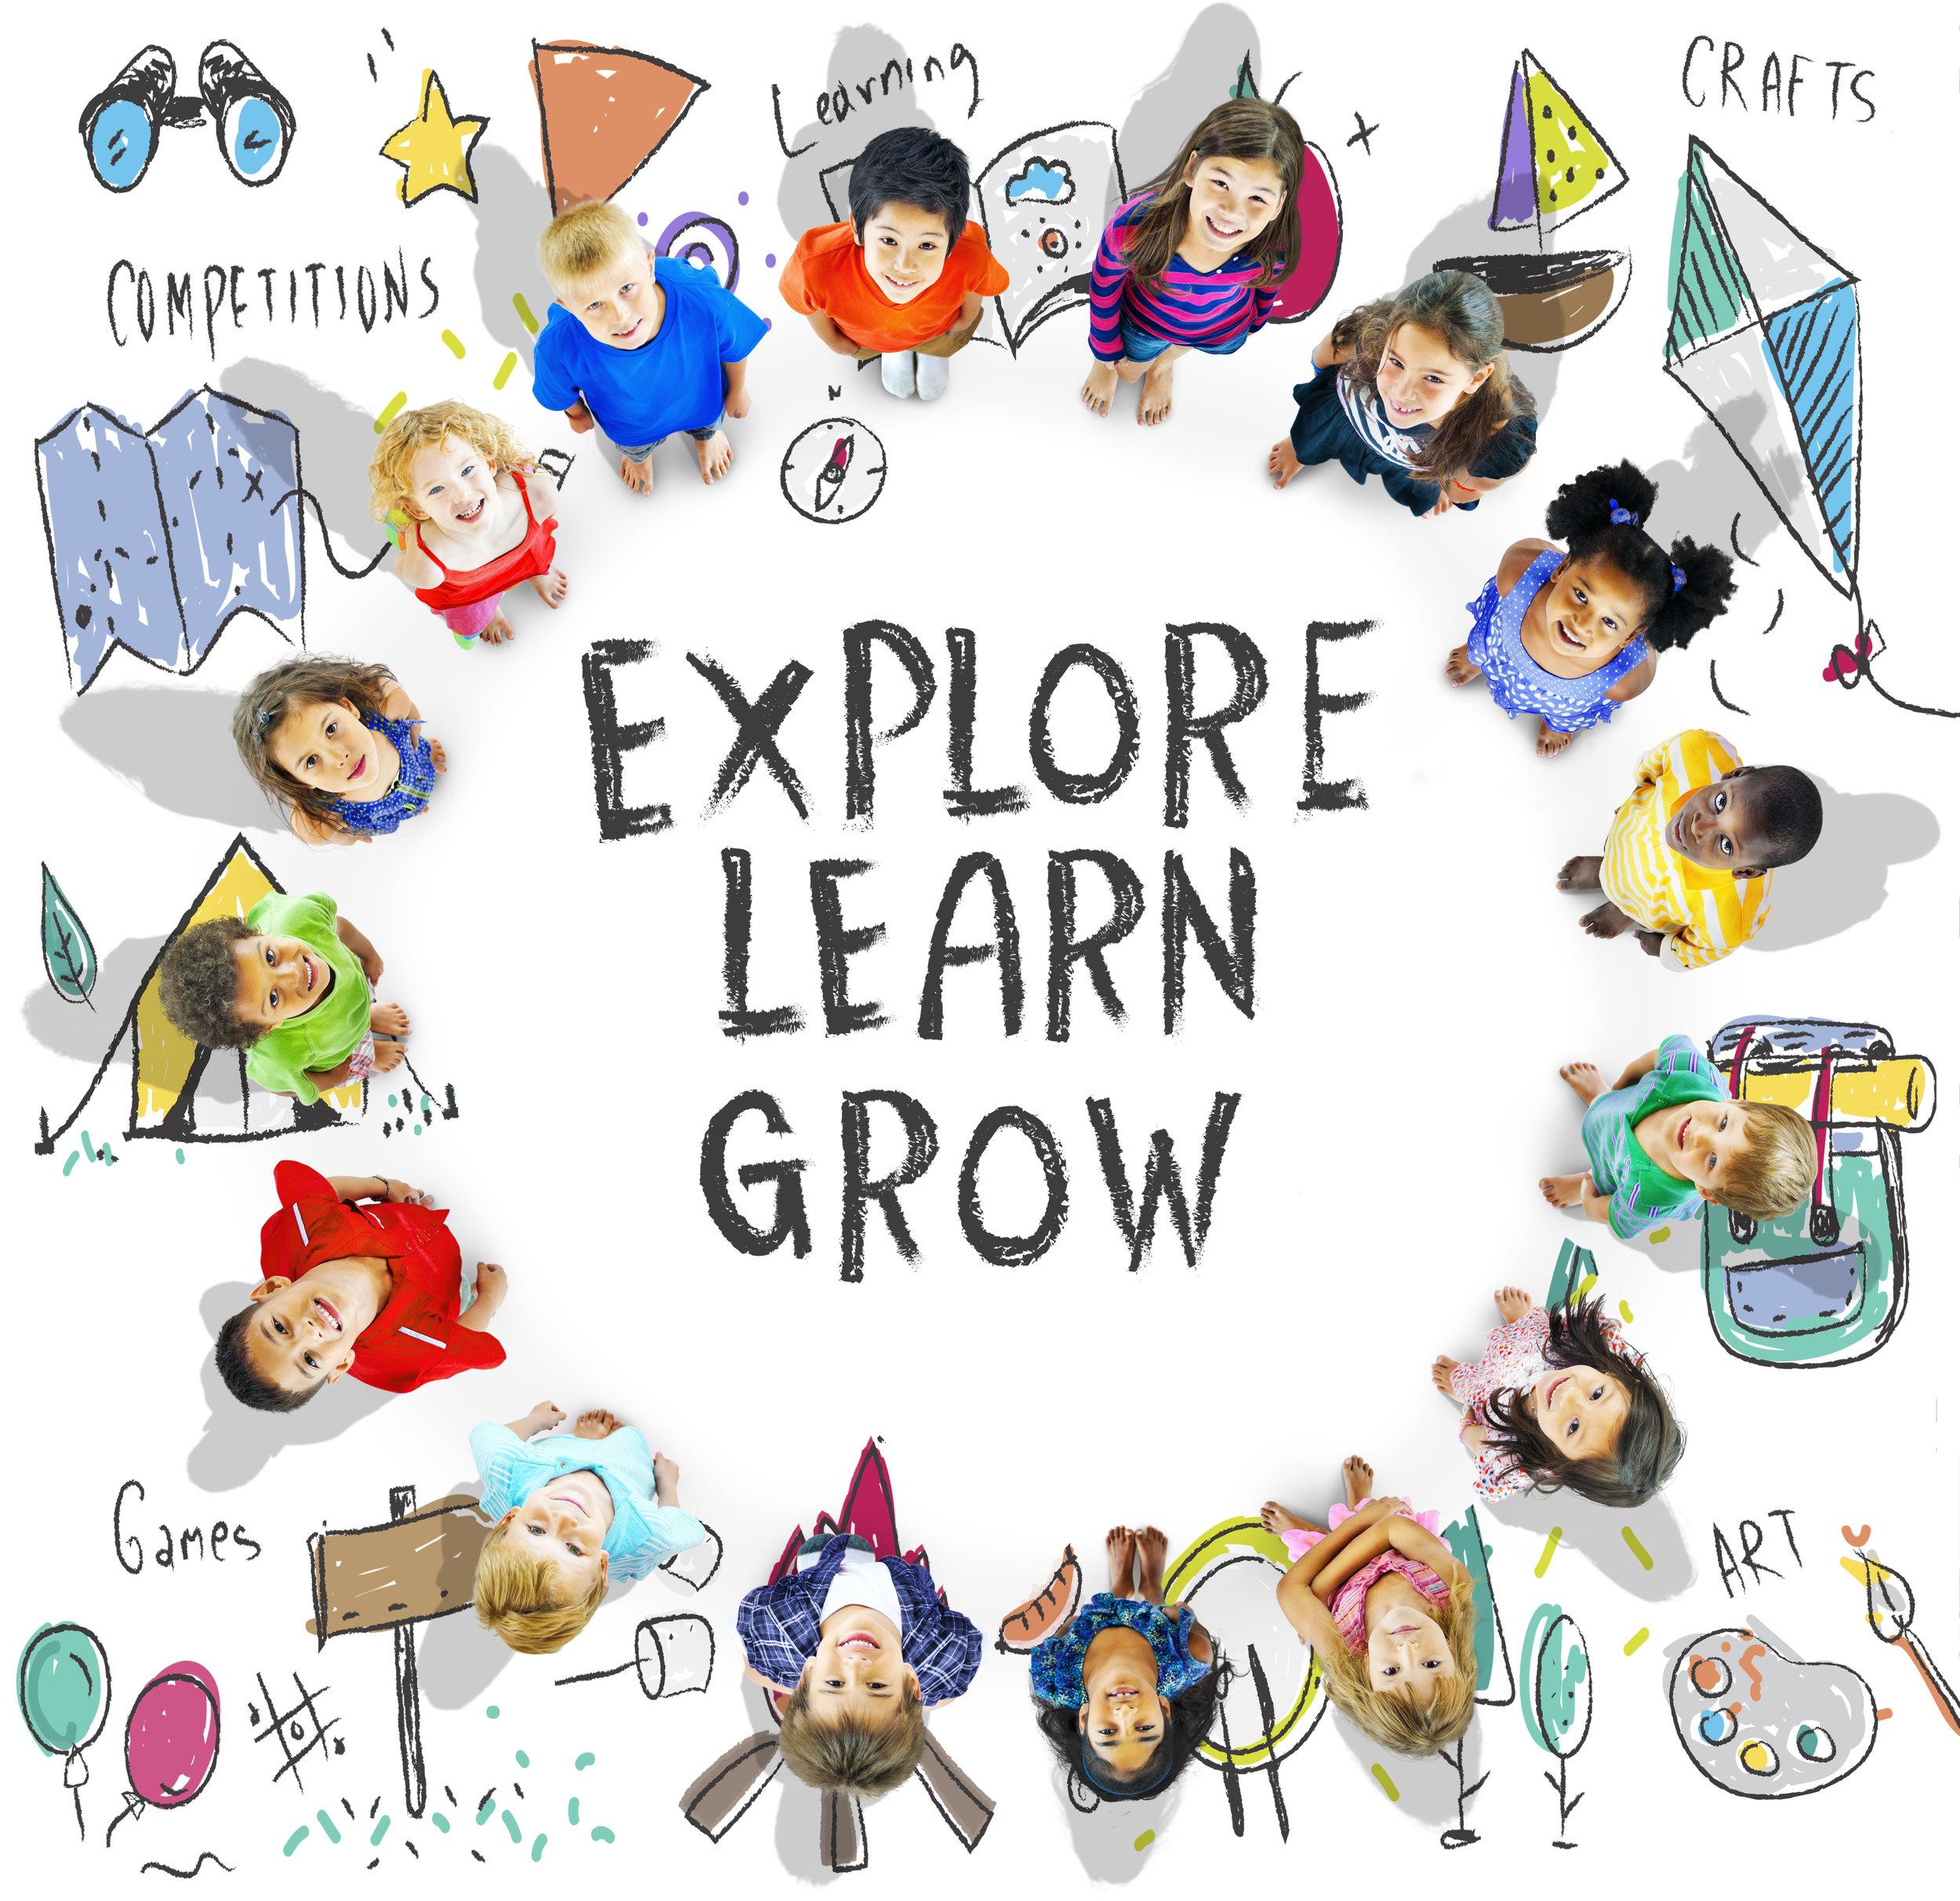 Explore, Learn, and Grow.jpeg